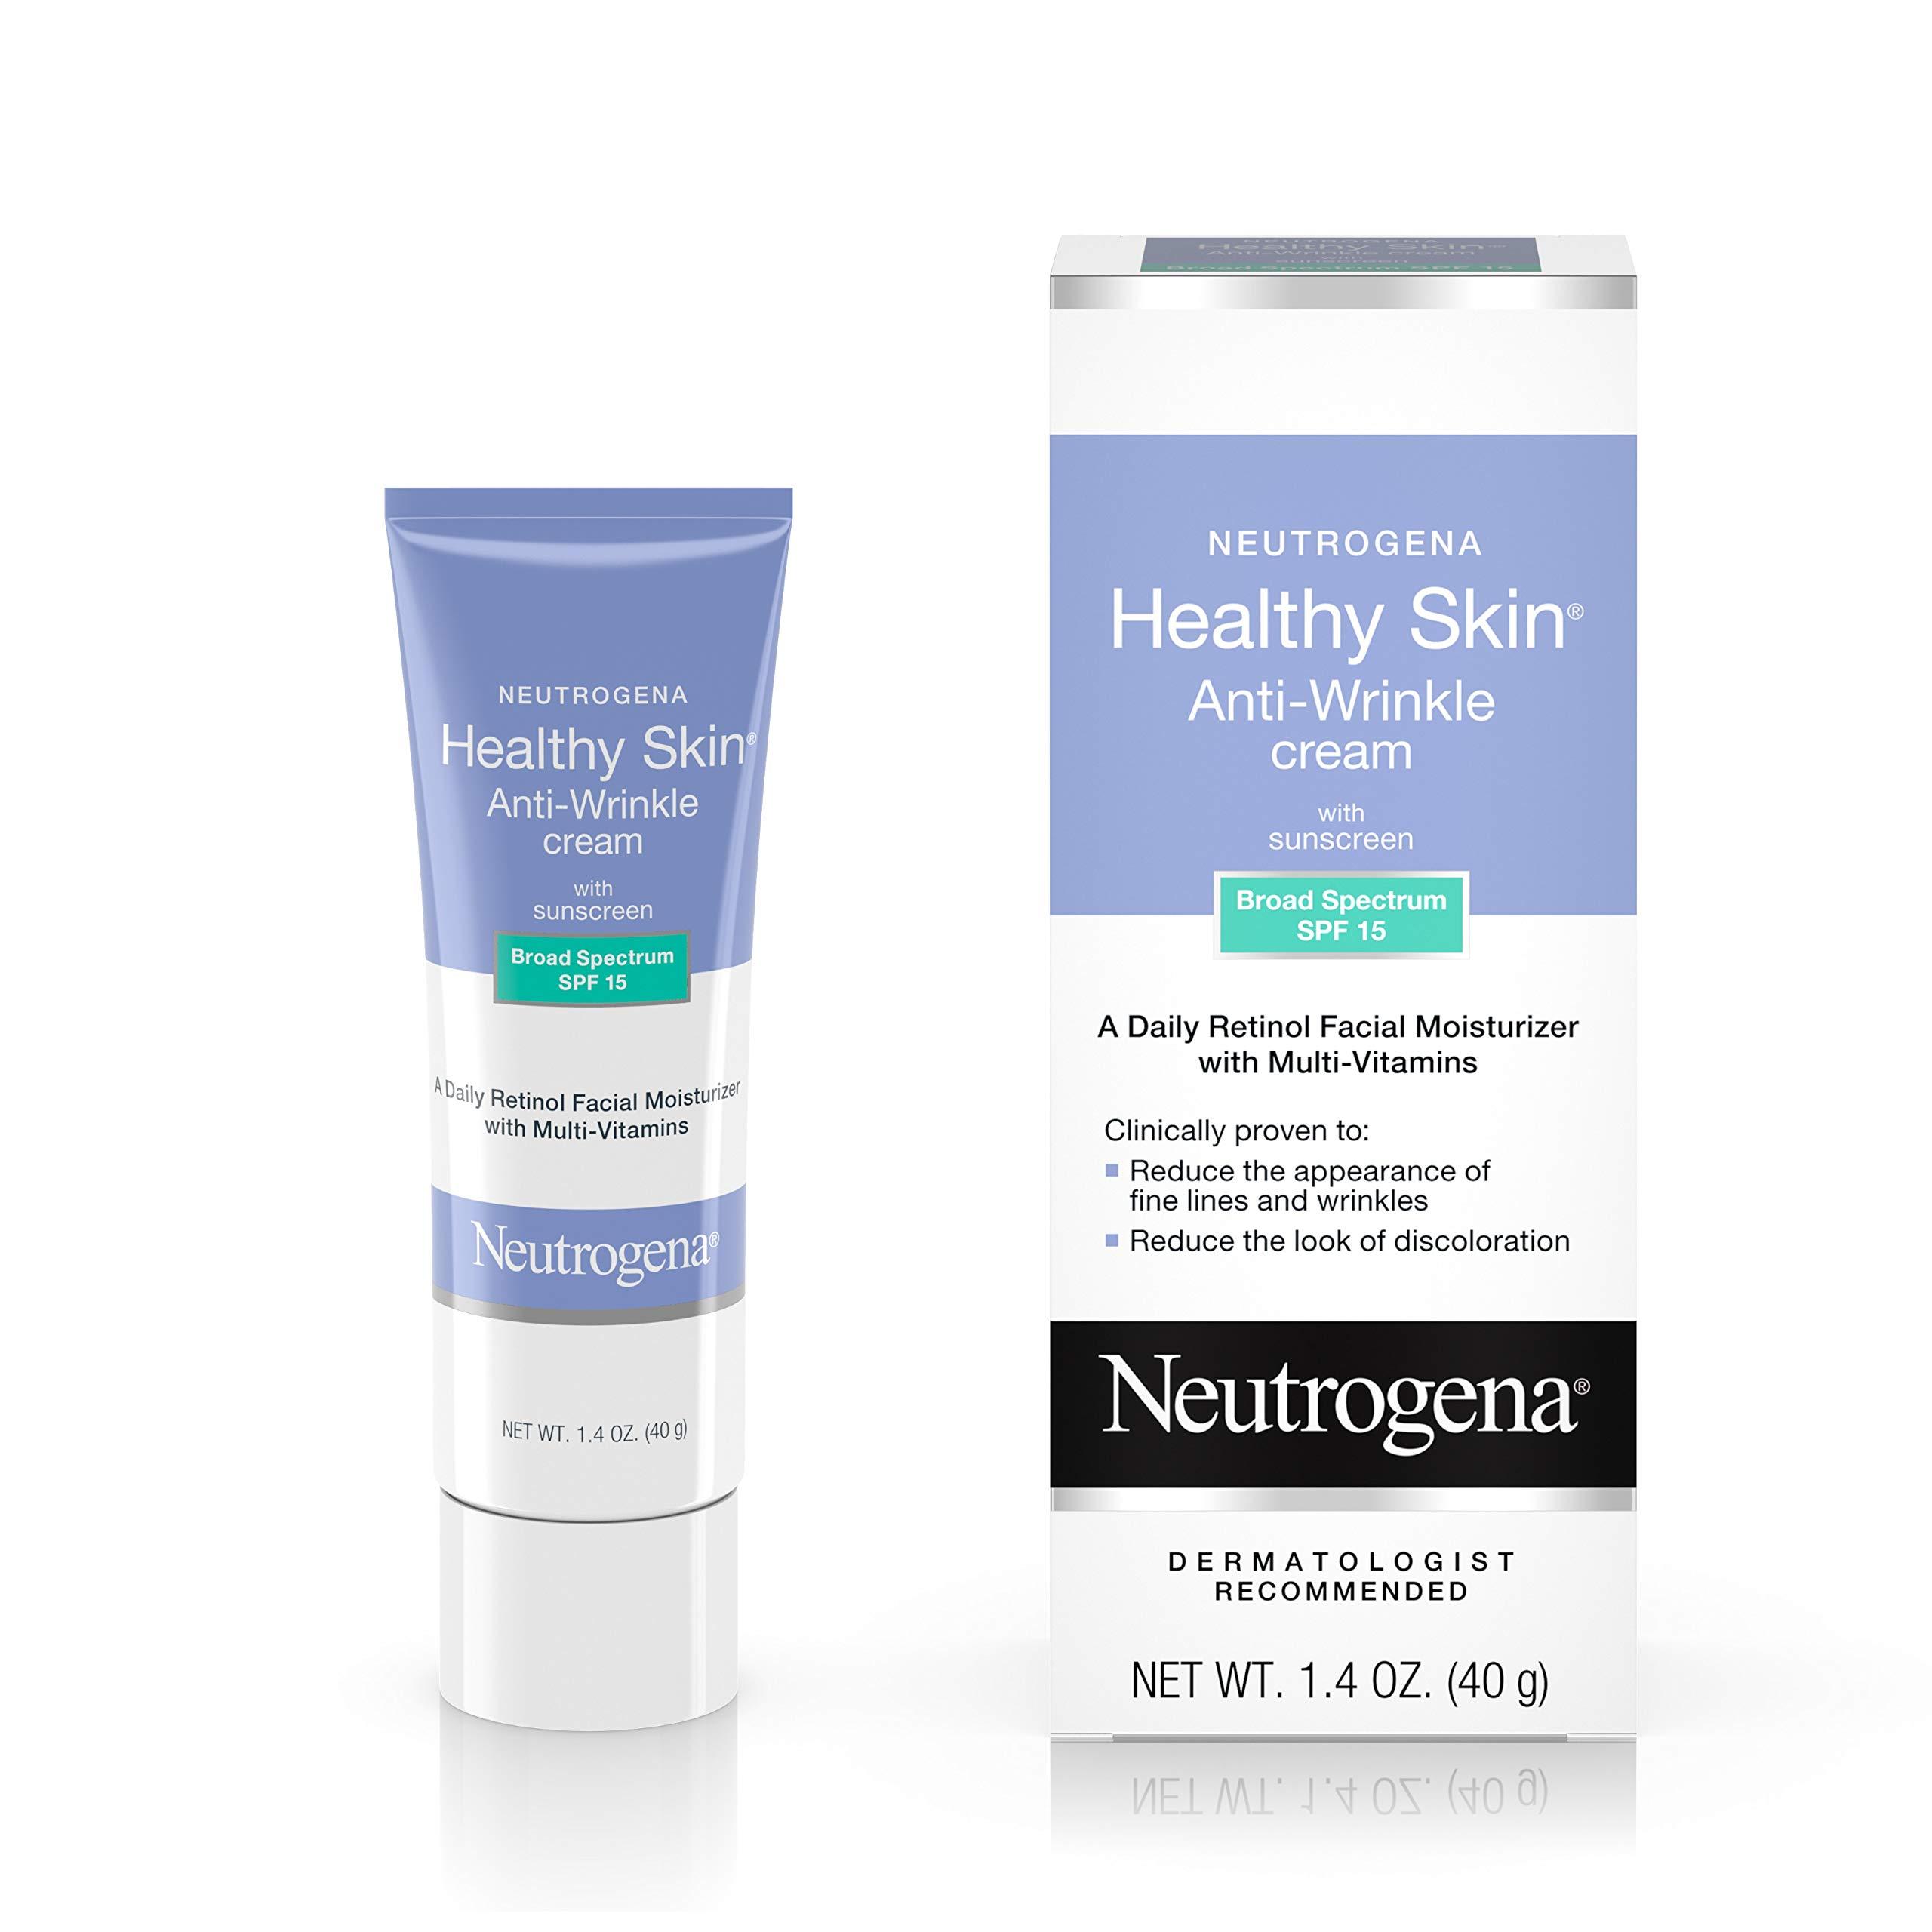 Neutrogena Healthy Skin Anti Wrinkle Retinol & Vitamin E Face & Neck Cream Moisturizer with SPF 15 Sunscreen, Oil-Free - Retinol, Green Tea, Glycerin, Vitamin E, Vitamin A & Vitamin B5, 1.4 oz by Neutrogena